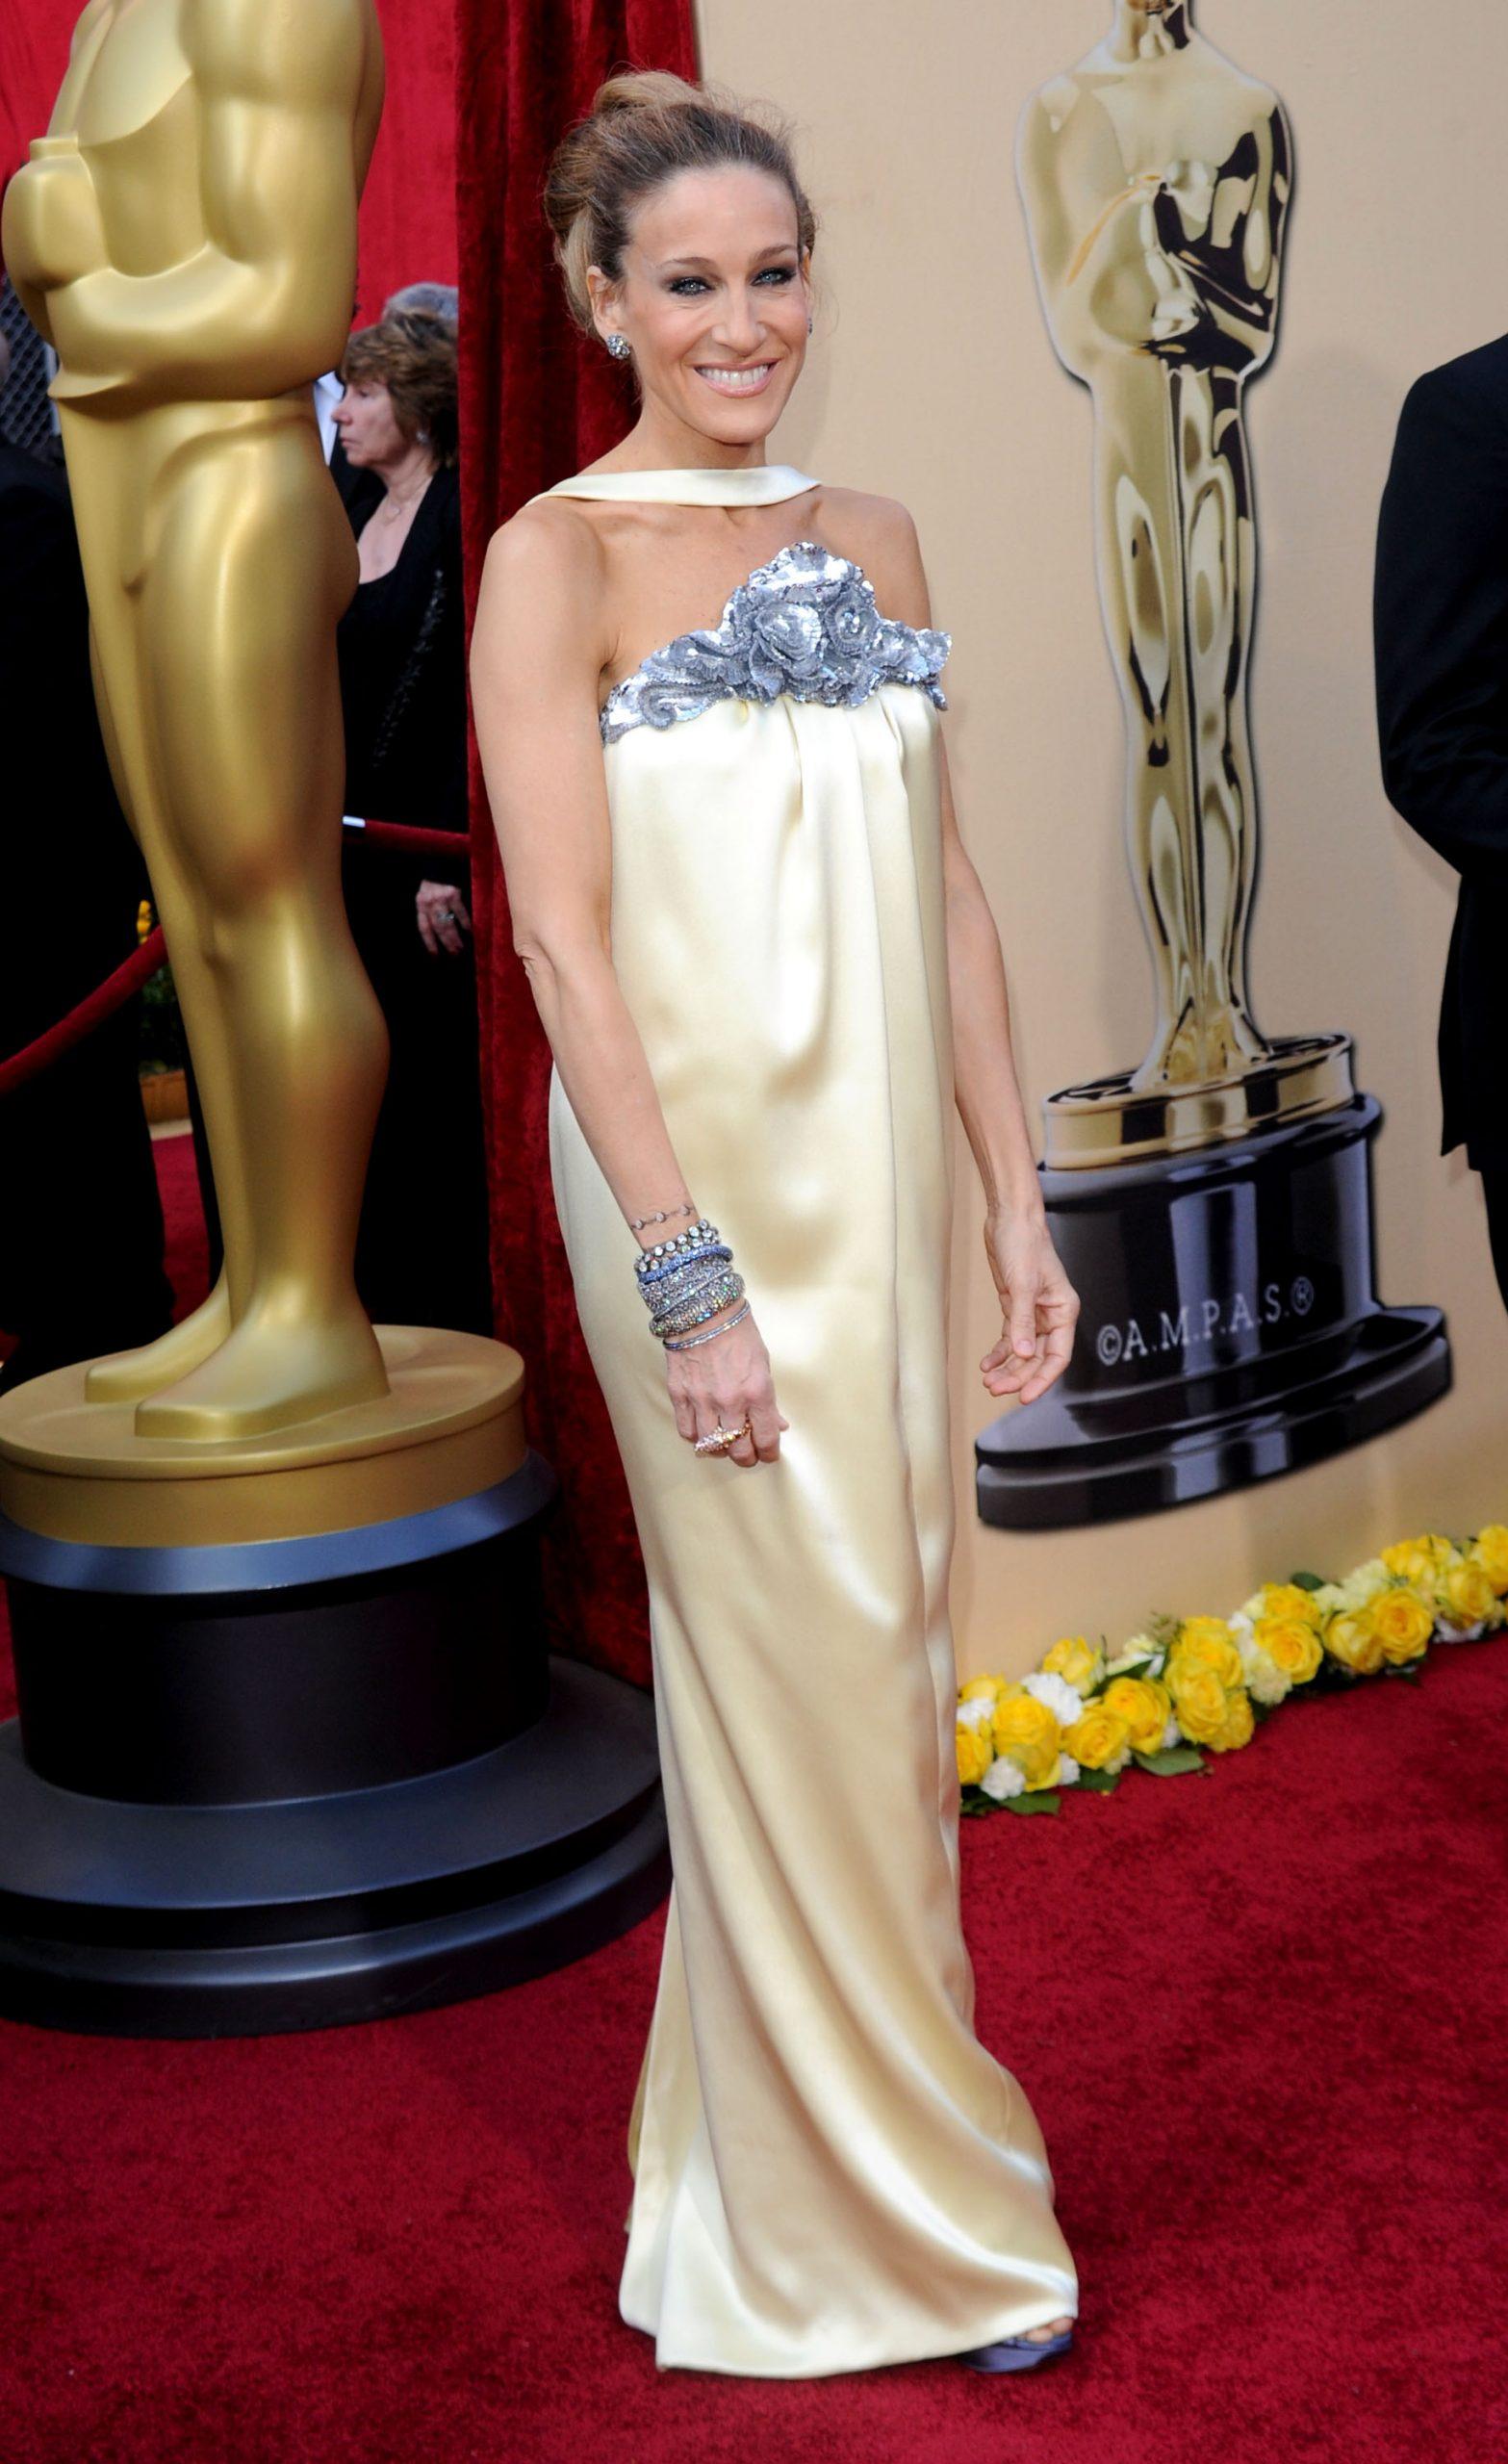 Sarah en los Oscar/Foto: Jason Merritt/Getty Images